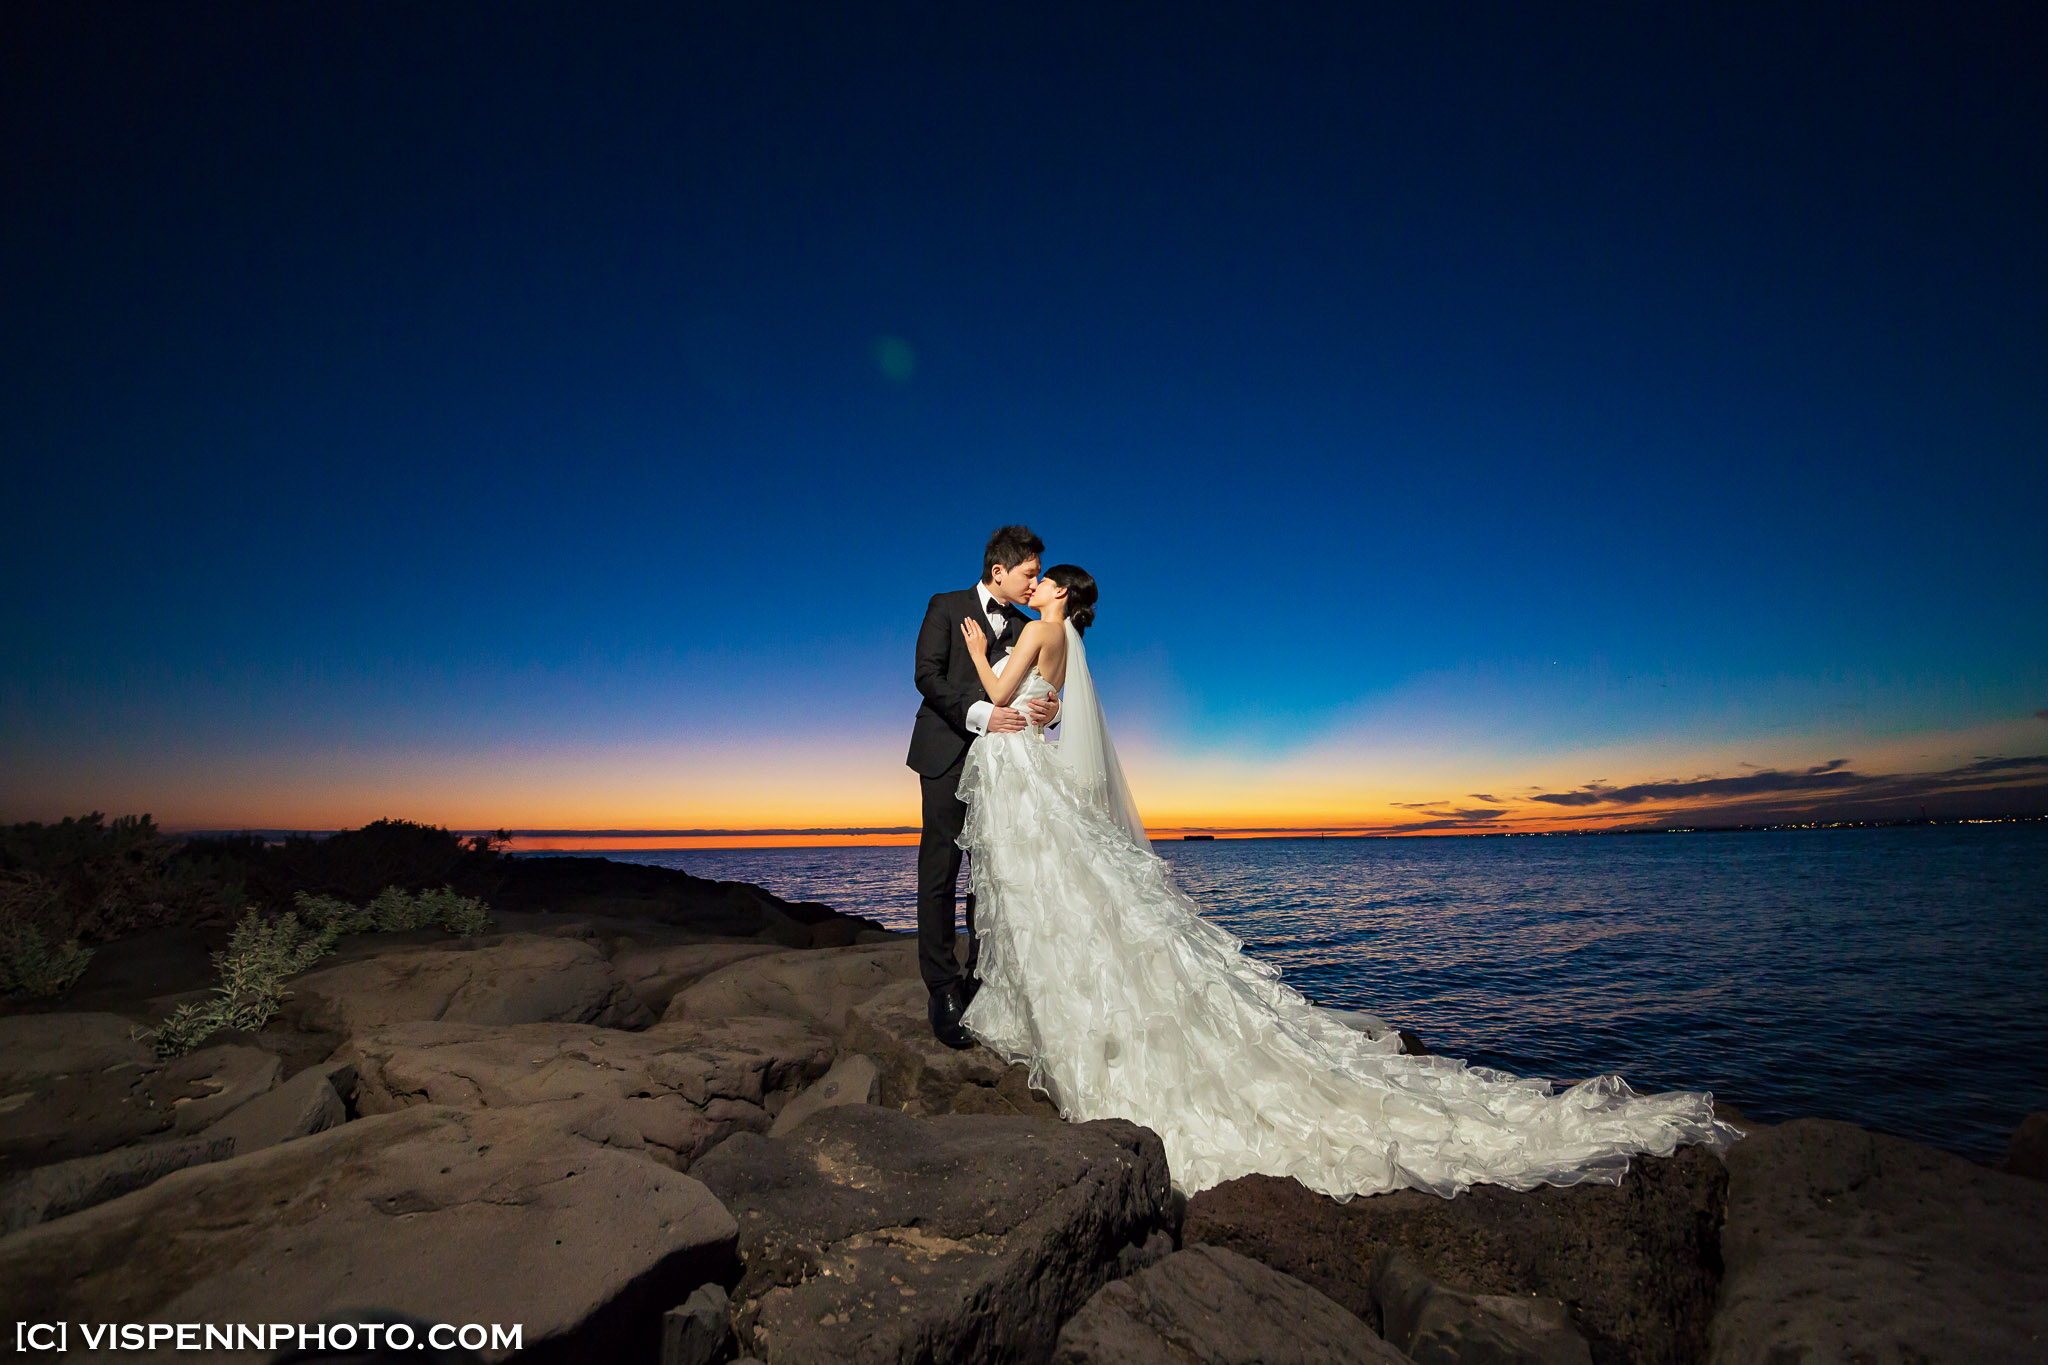 PRE WEDDING Photography Melbourne VISPENN 墨尔本 婚纱照 结婚照 婚纱摄影 DaisyPreWedding 4430